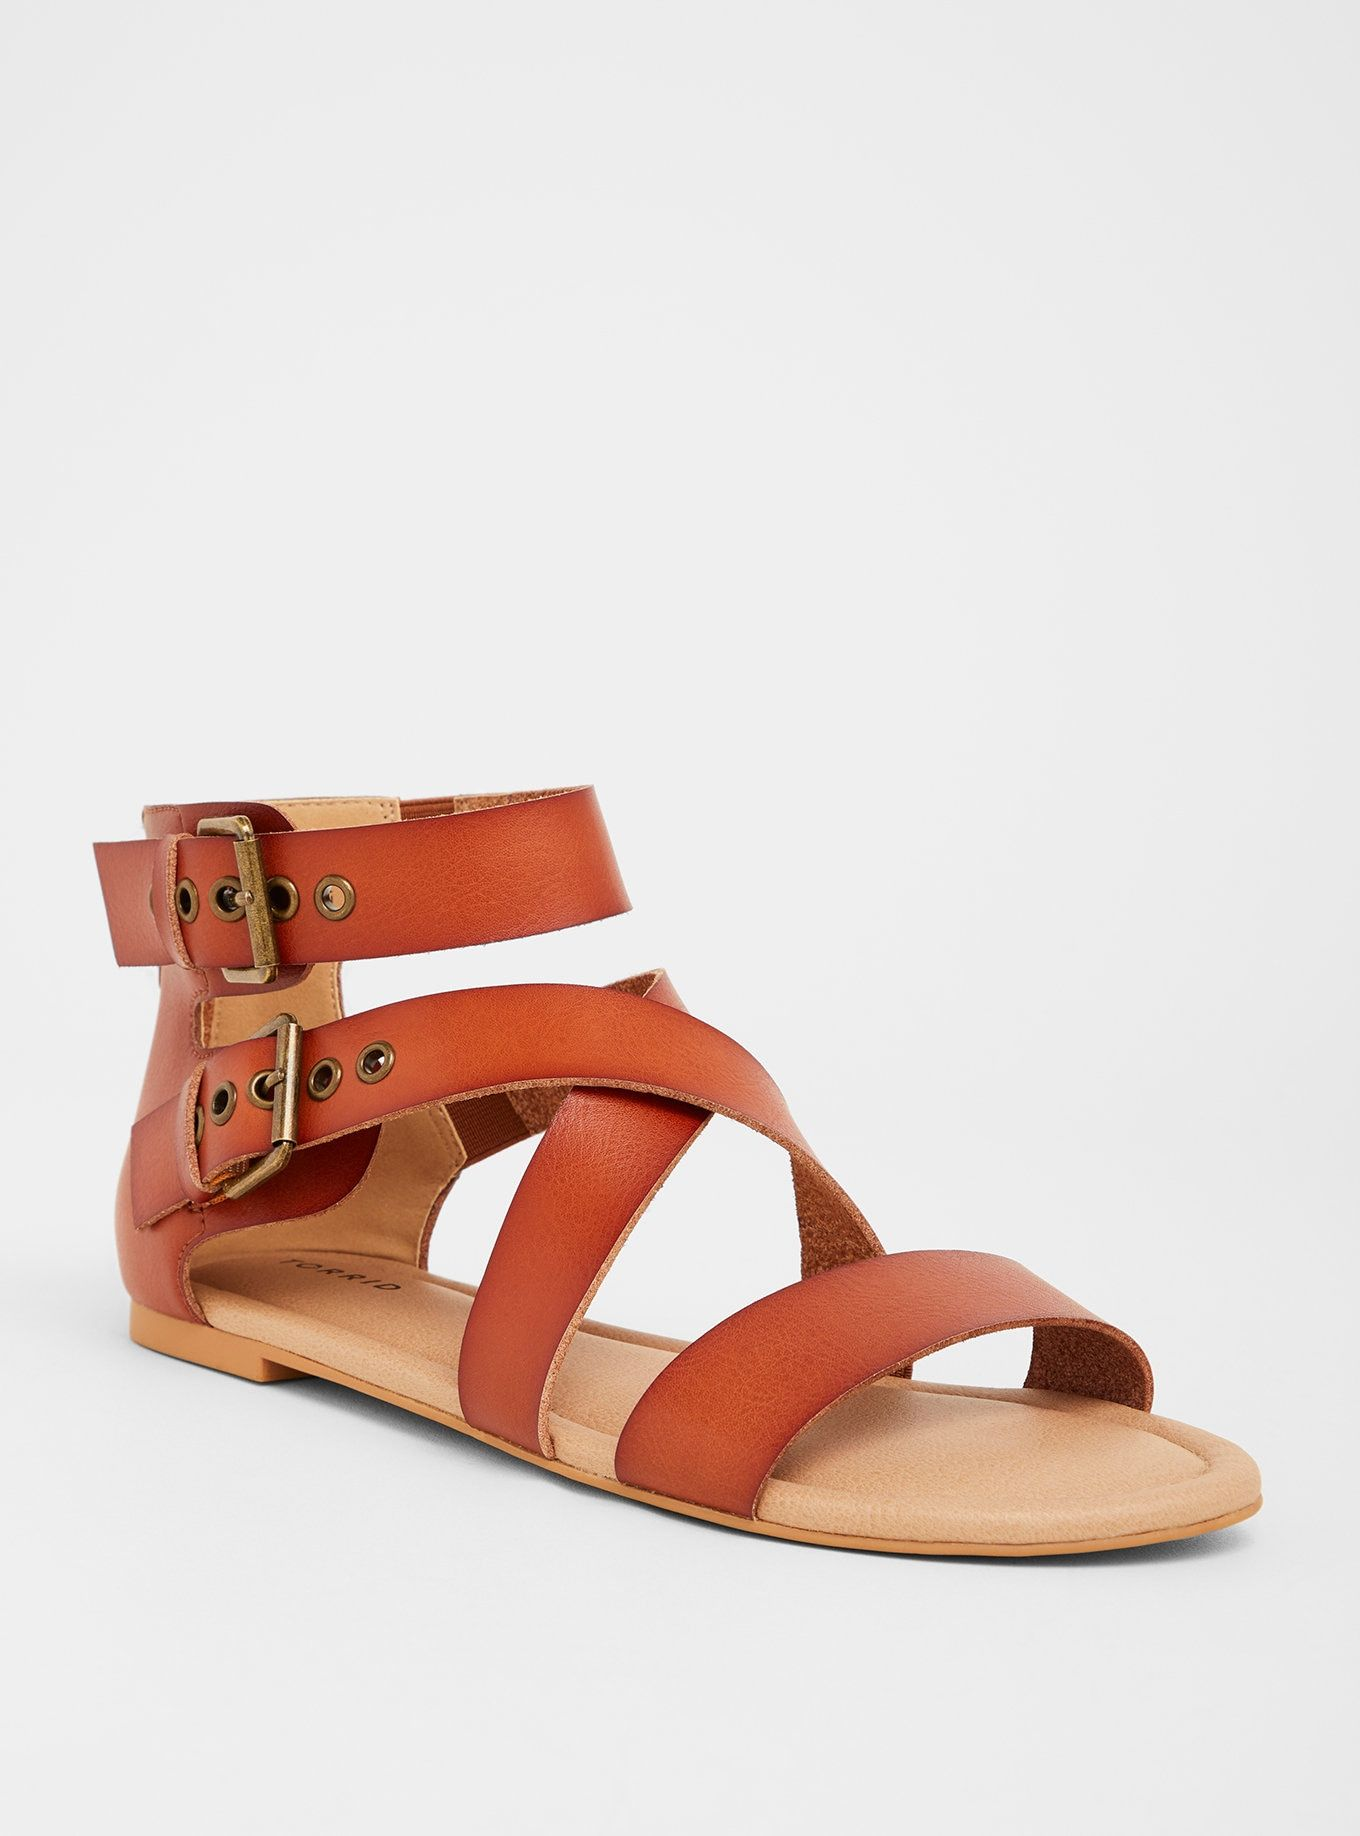 30b1ae65e9f Tan Gladiator Sandal (Wide Width)